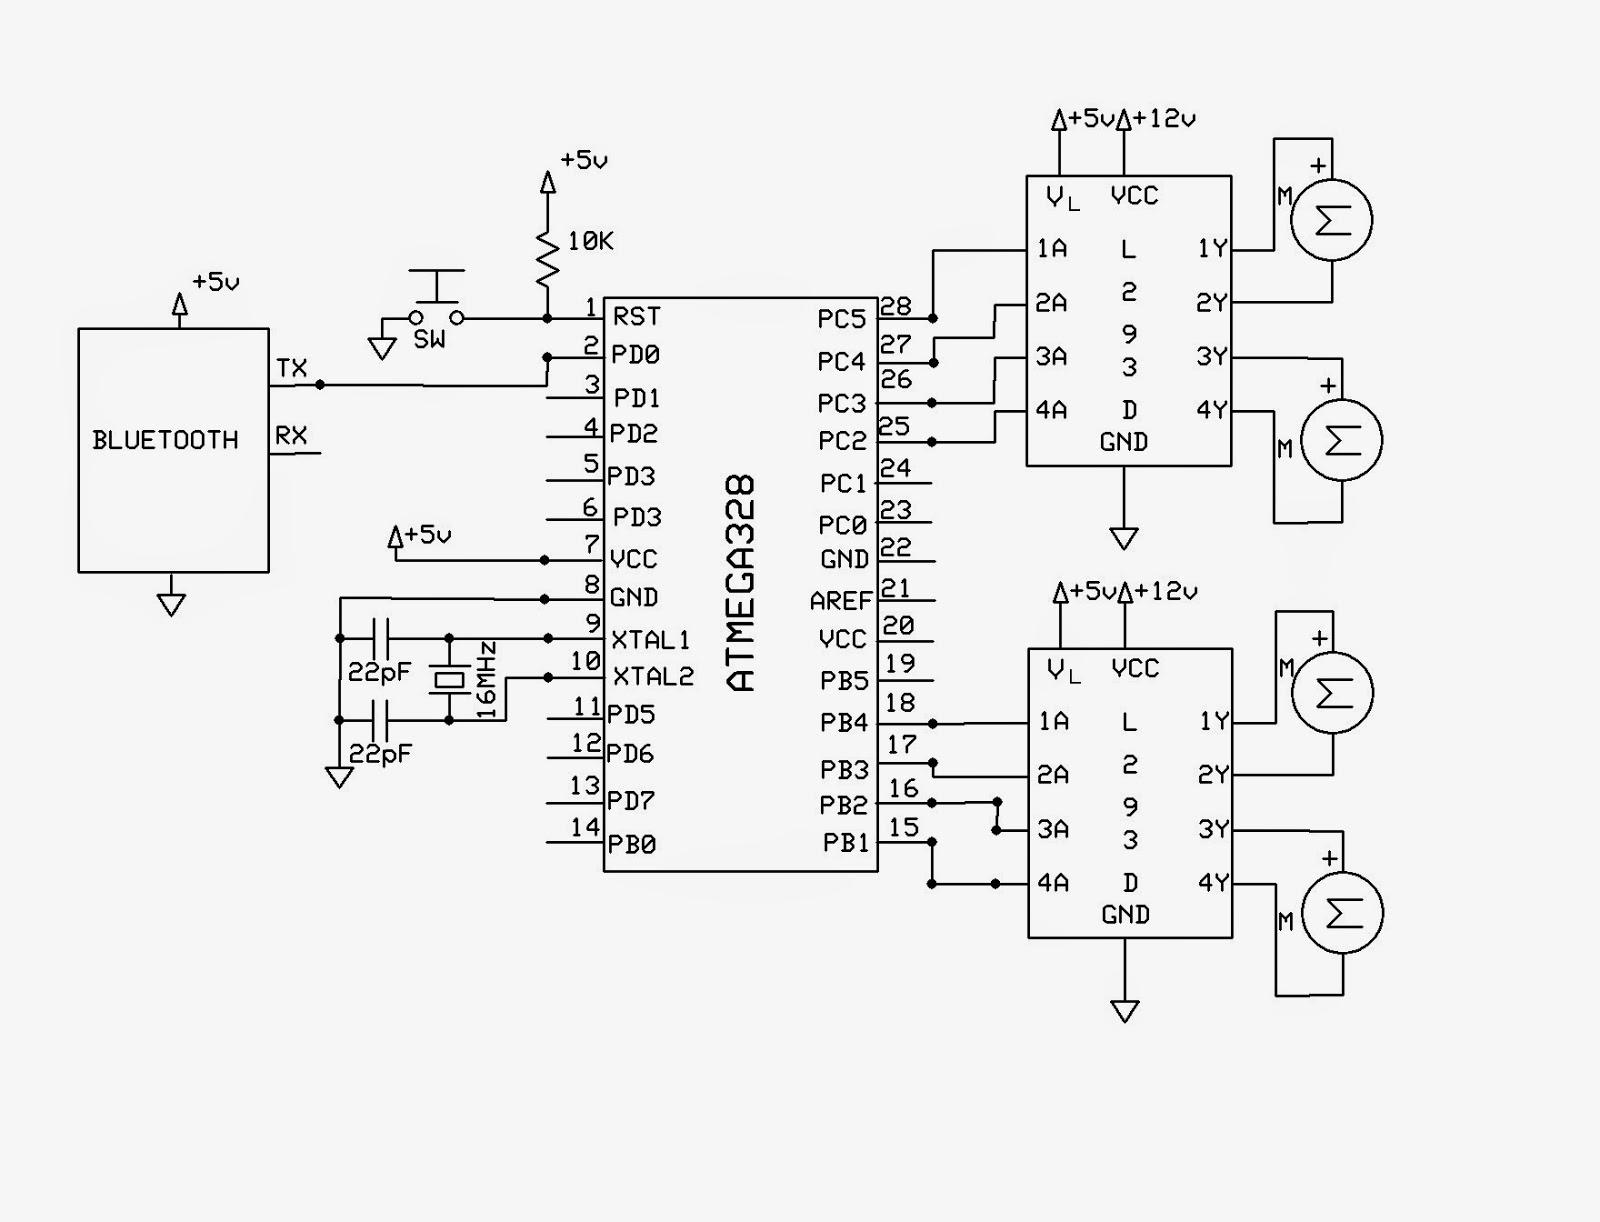 EMERGING TECHNOLOGIES BLUETOOTH CONTROLLED ROBOT